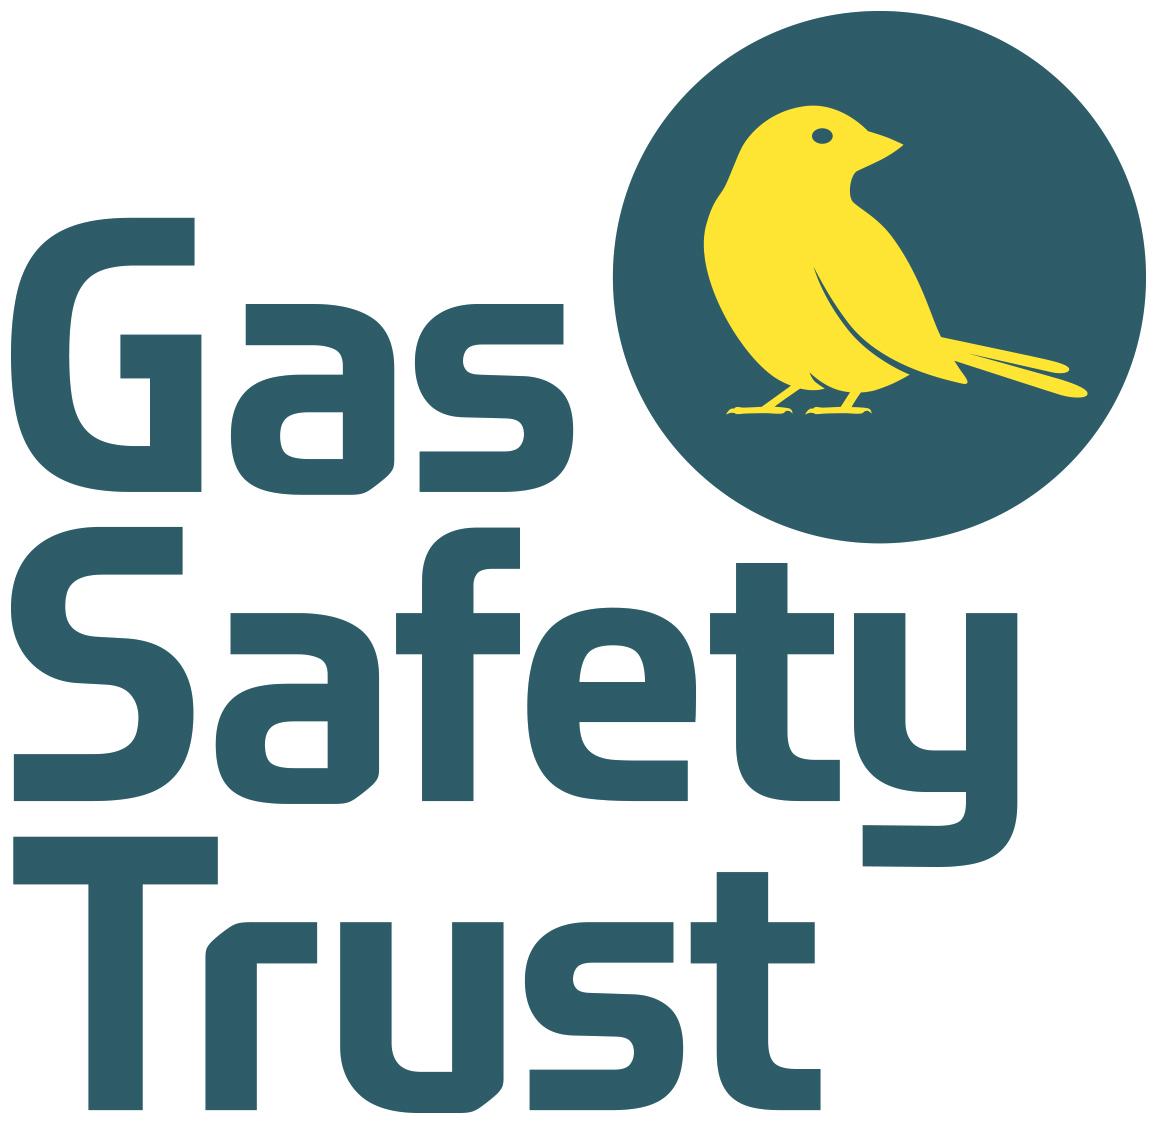 GST logo cmyk